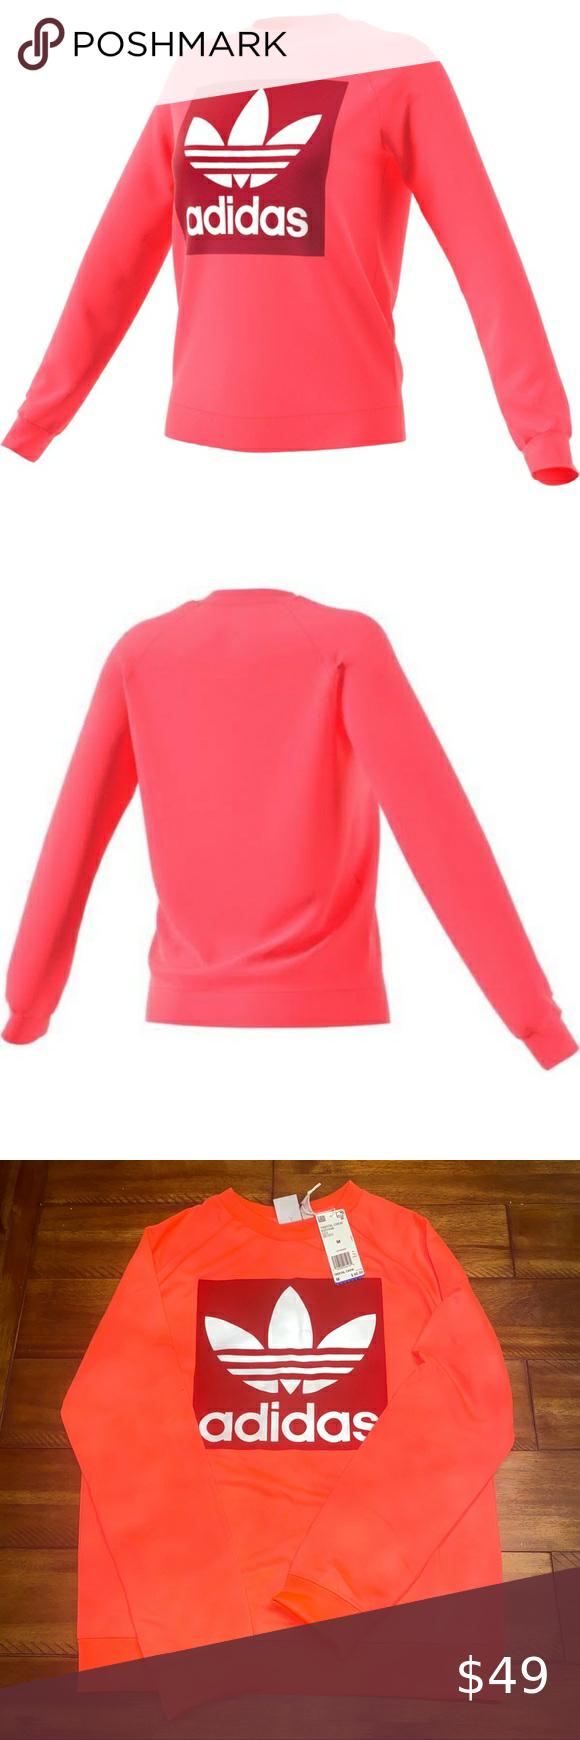 Adidas Originals Trefoil Crewneck Sweatshirt Brand New Hot Pink Is The Trend Of The Season Adida Sweatshirts Crew Neck Sweatshirt Branded Sweatshirts [ 1740 x 580 Pixel ]